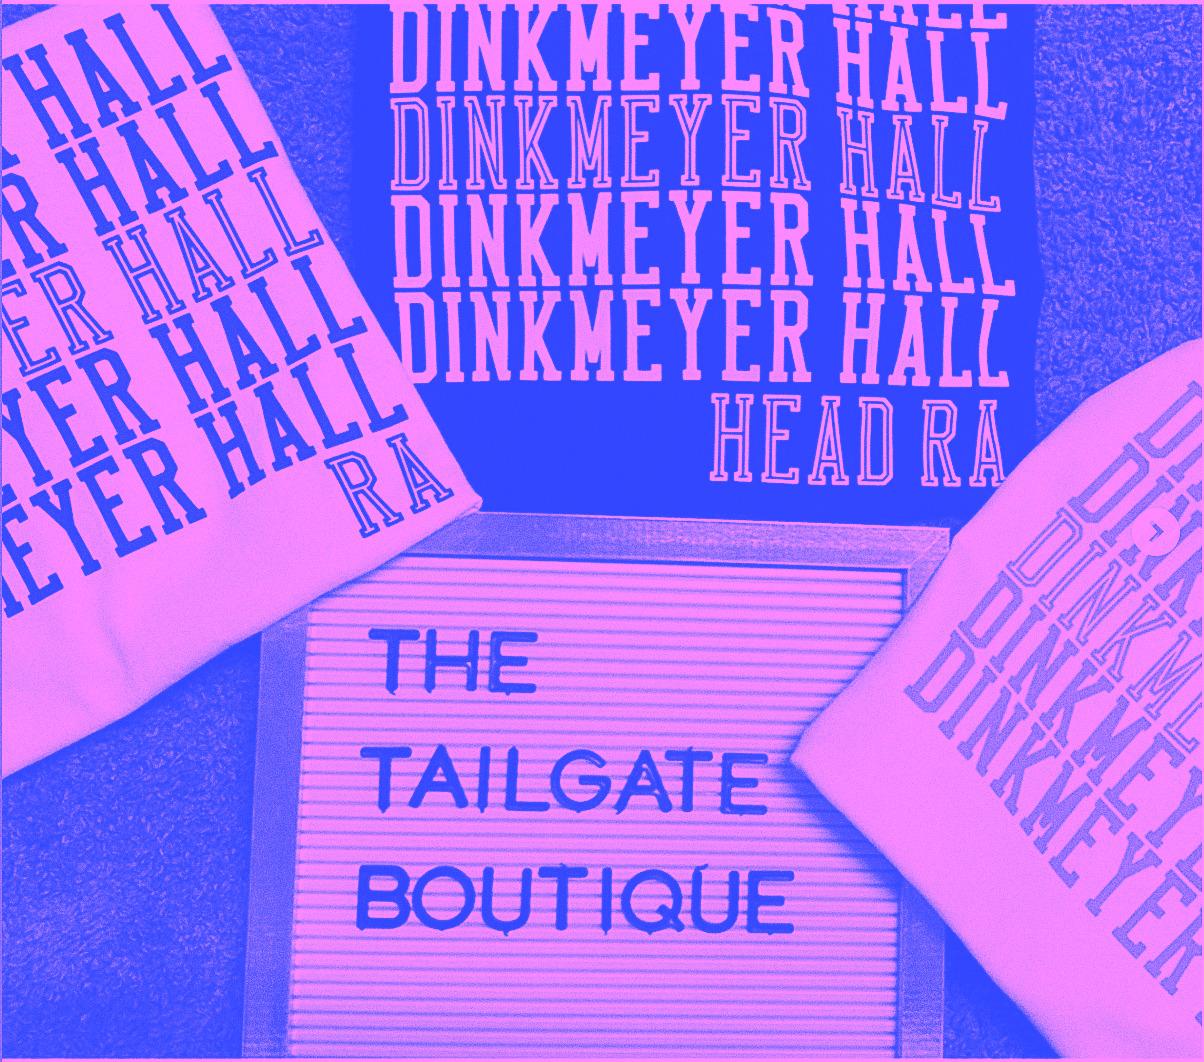 tailgate boutique